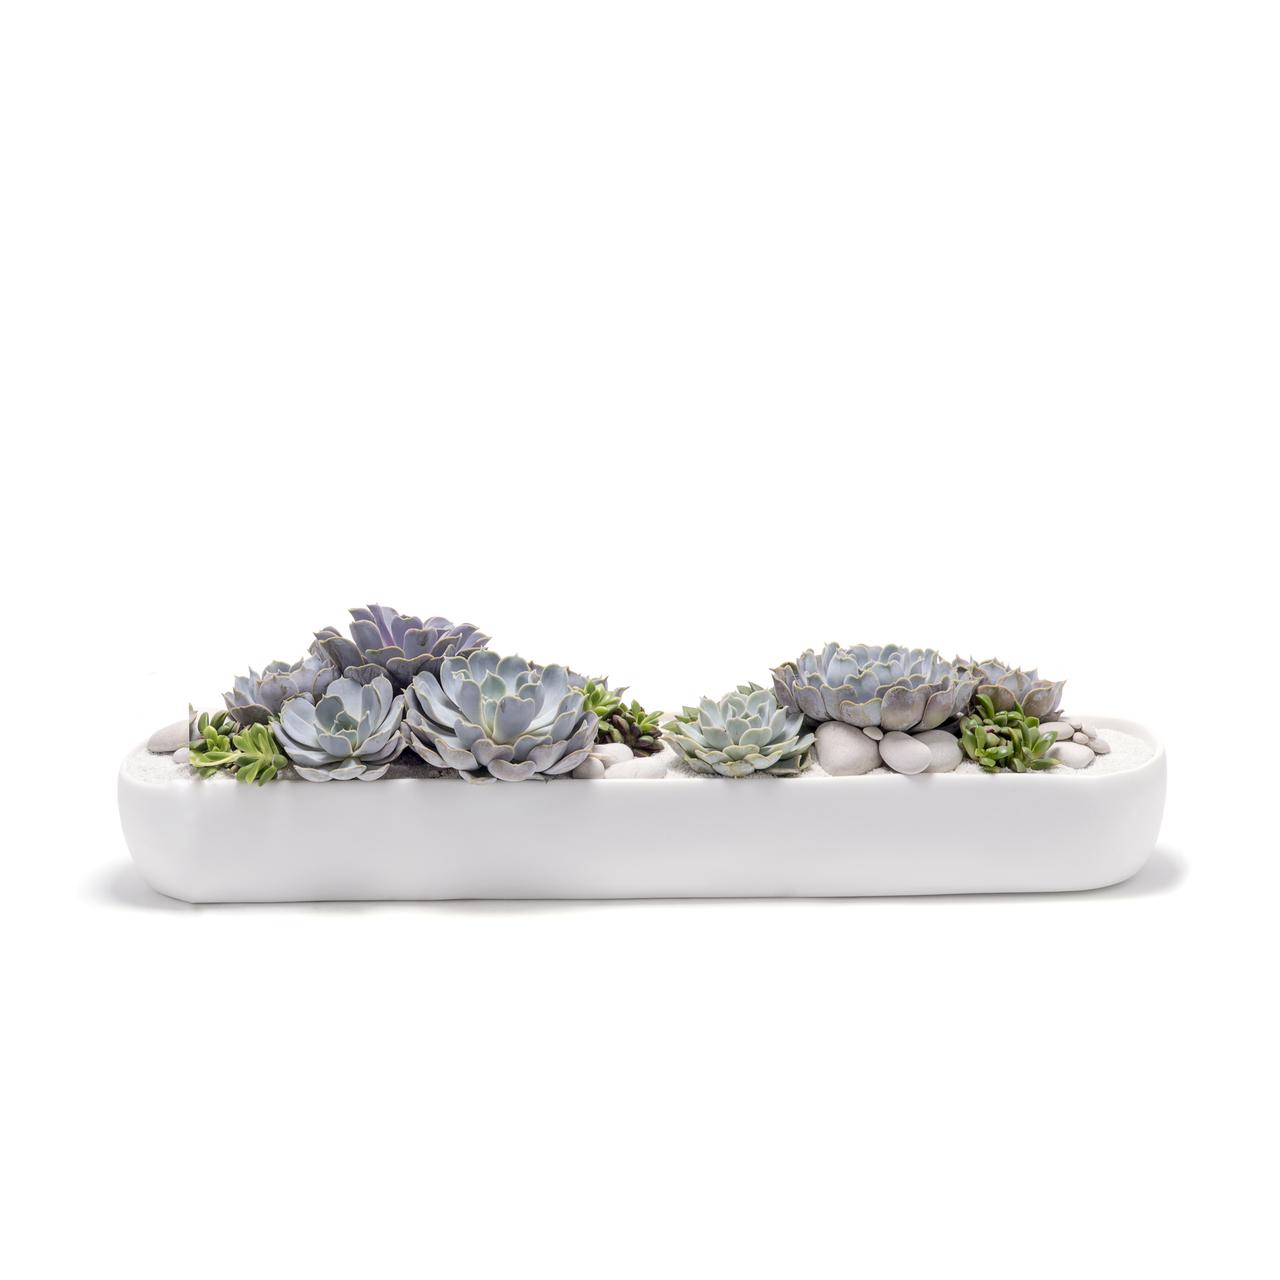 "California Long Small White - Echeverria Succulents (7"" H x 21.5"" W)"